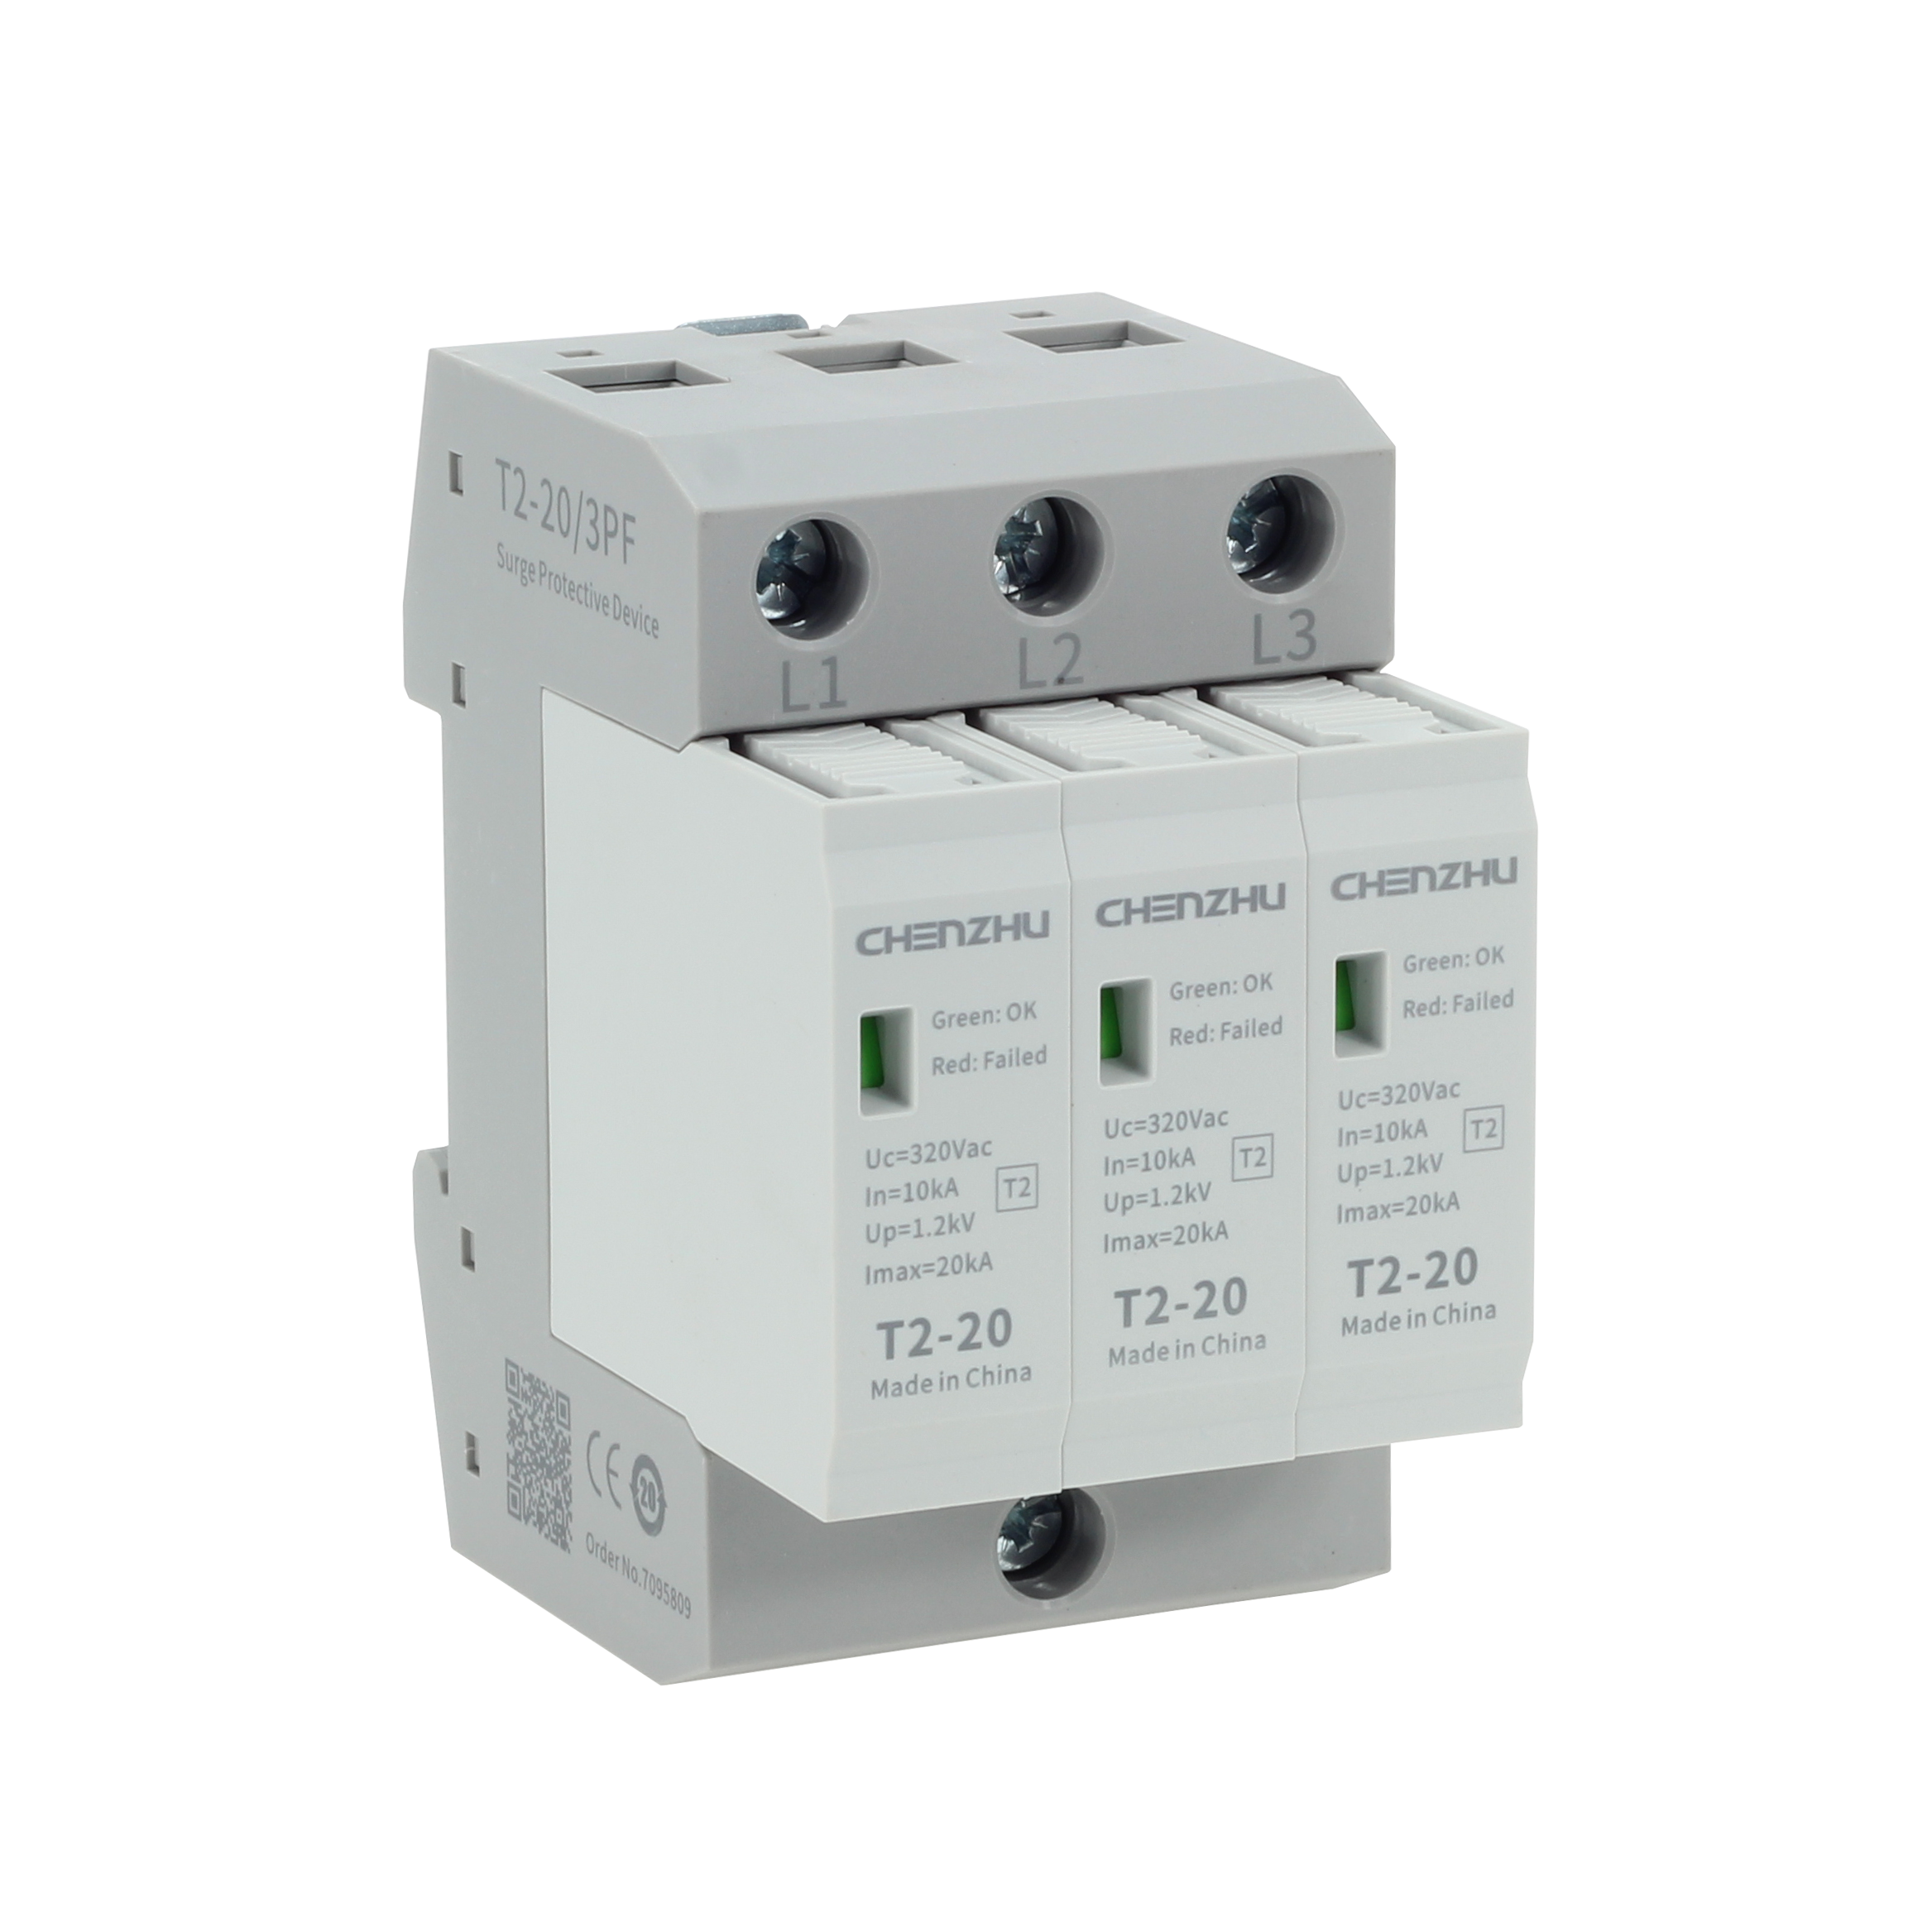 AC Power SPD (220/380VAC; IT or TN-C system, Three phase; In=10kA; alarm output ) 7075639